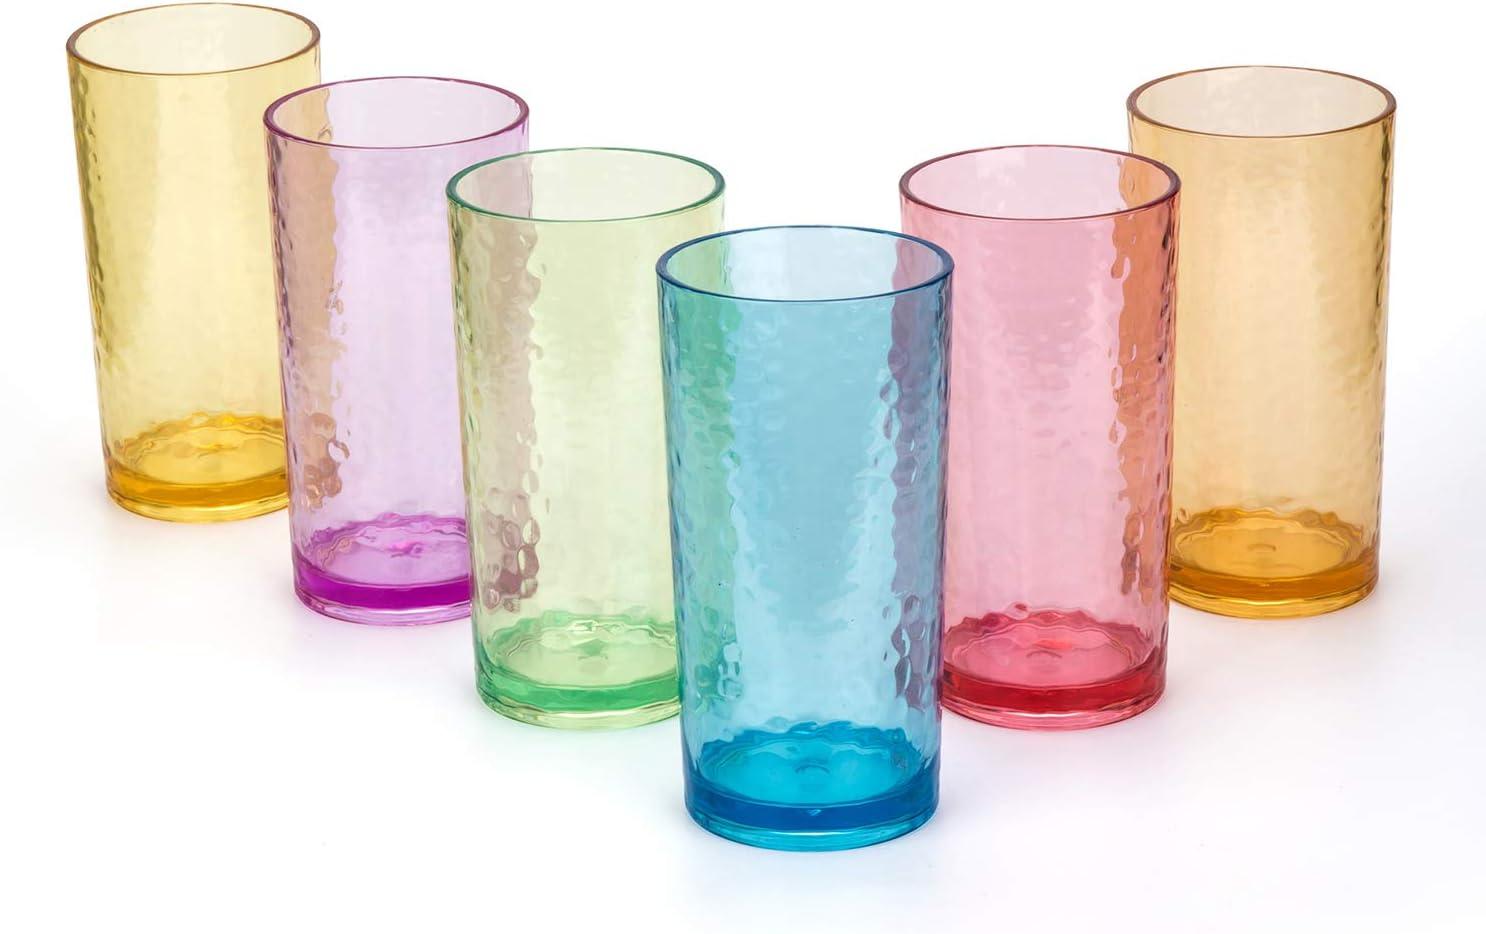 20-ounce Acrylic Glasses Plastic Tumbler, set of 6 Multicolor - Hammered Style, Dishwasher Safe, BPA Free